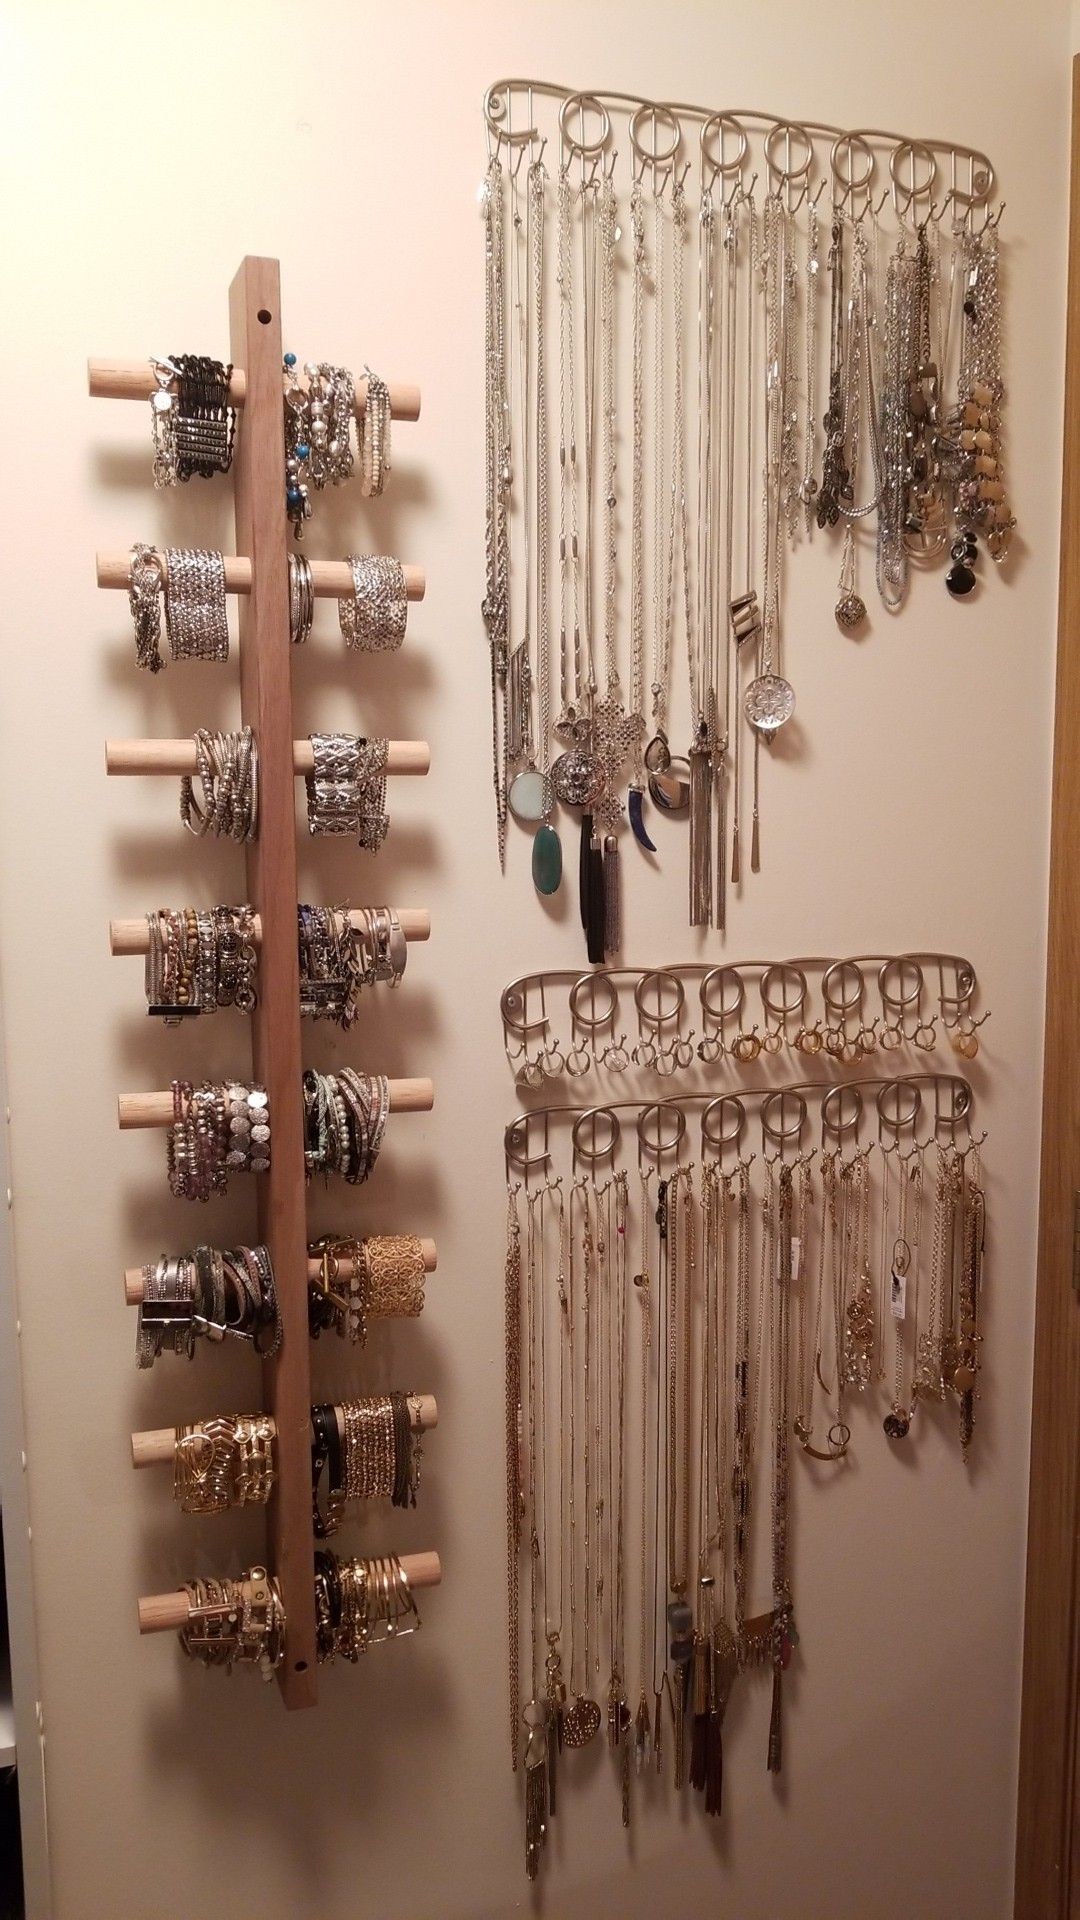 Porta Orecchini Da Parete bracelet holder (diy); necklace and ring holders (from bb&b